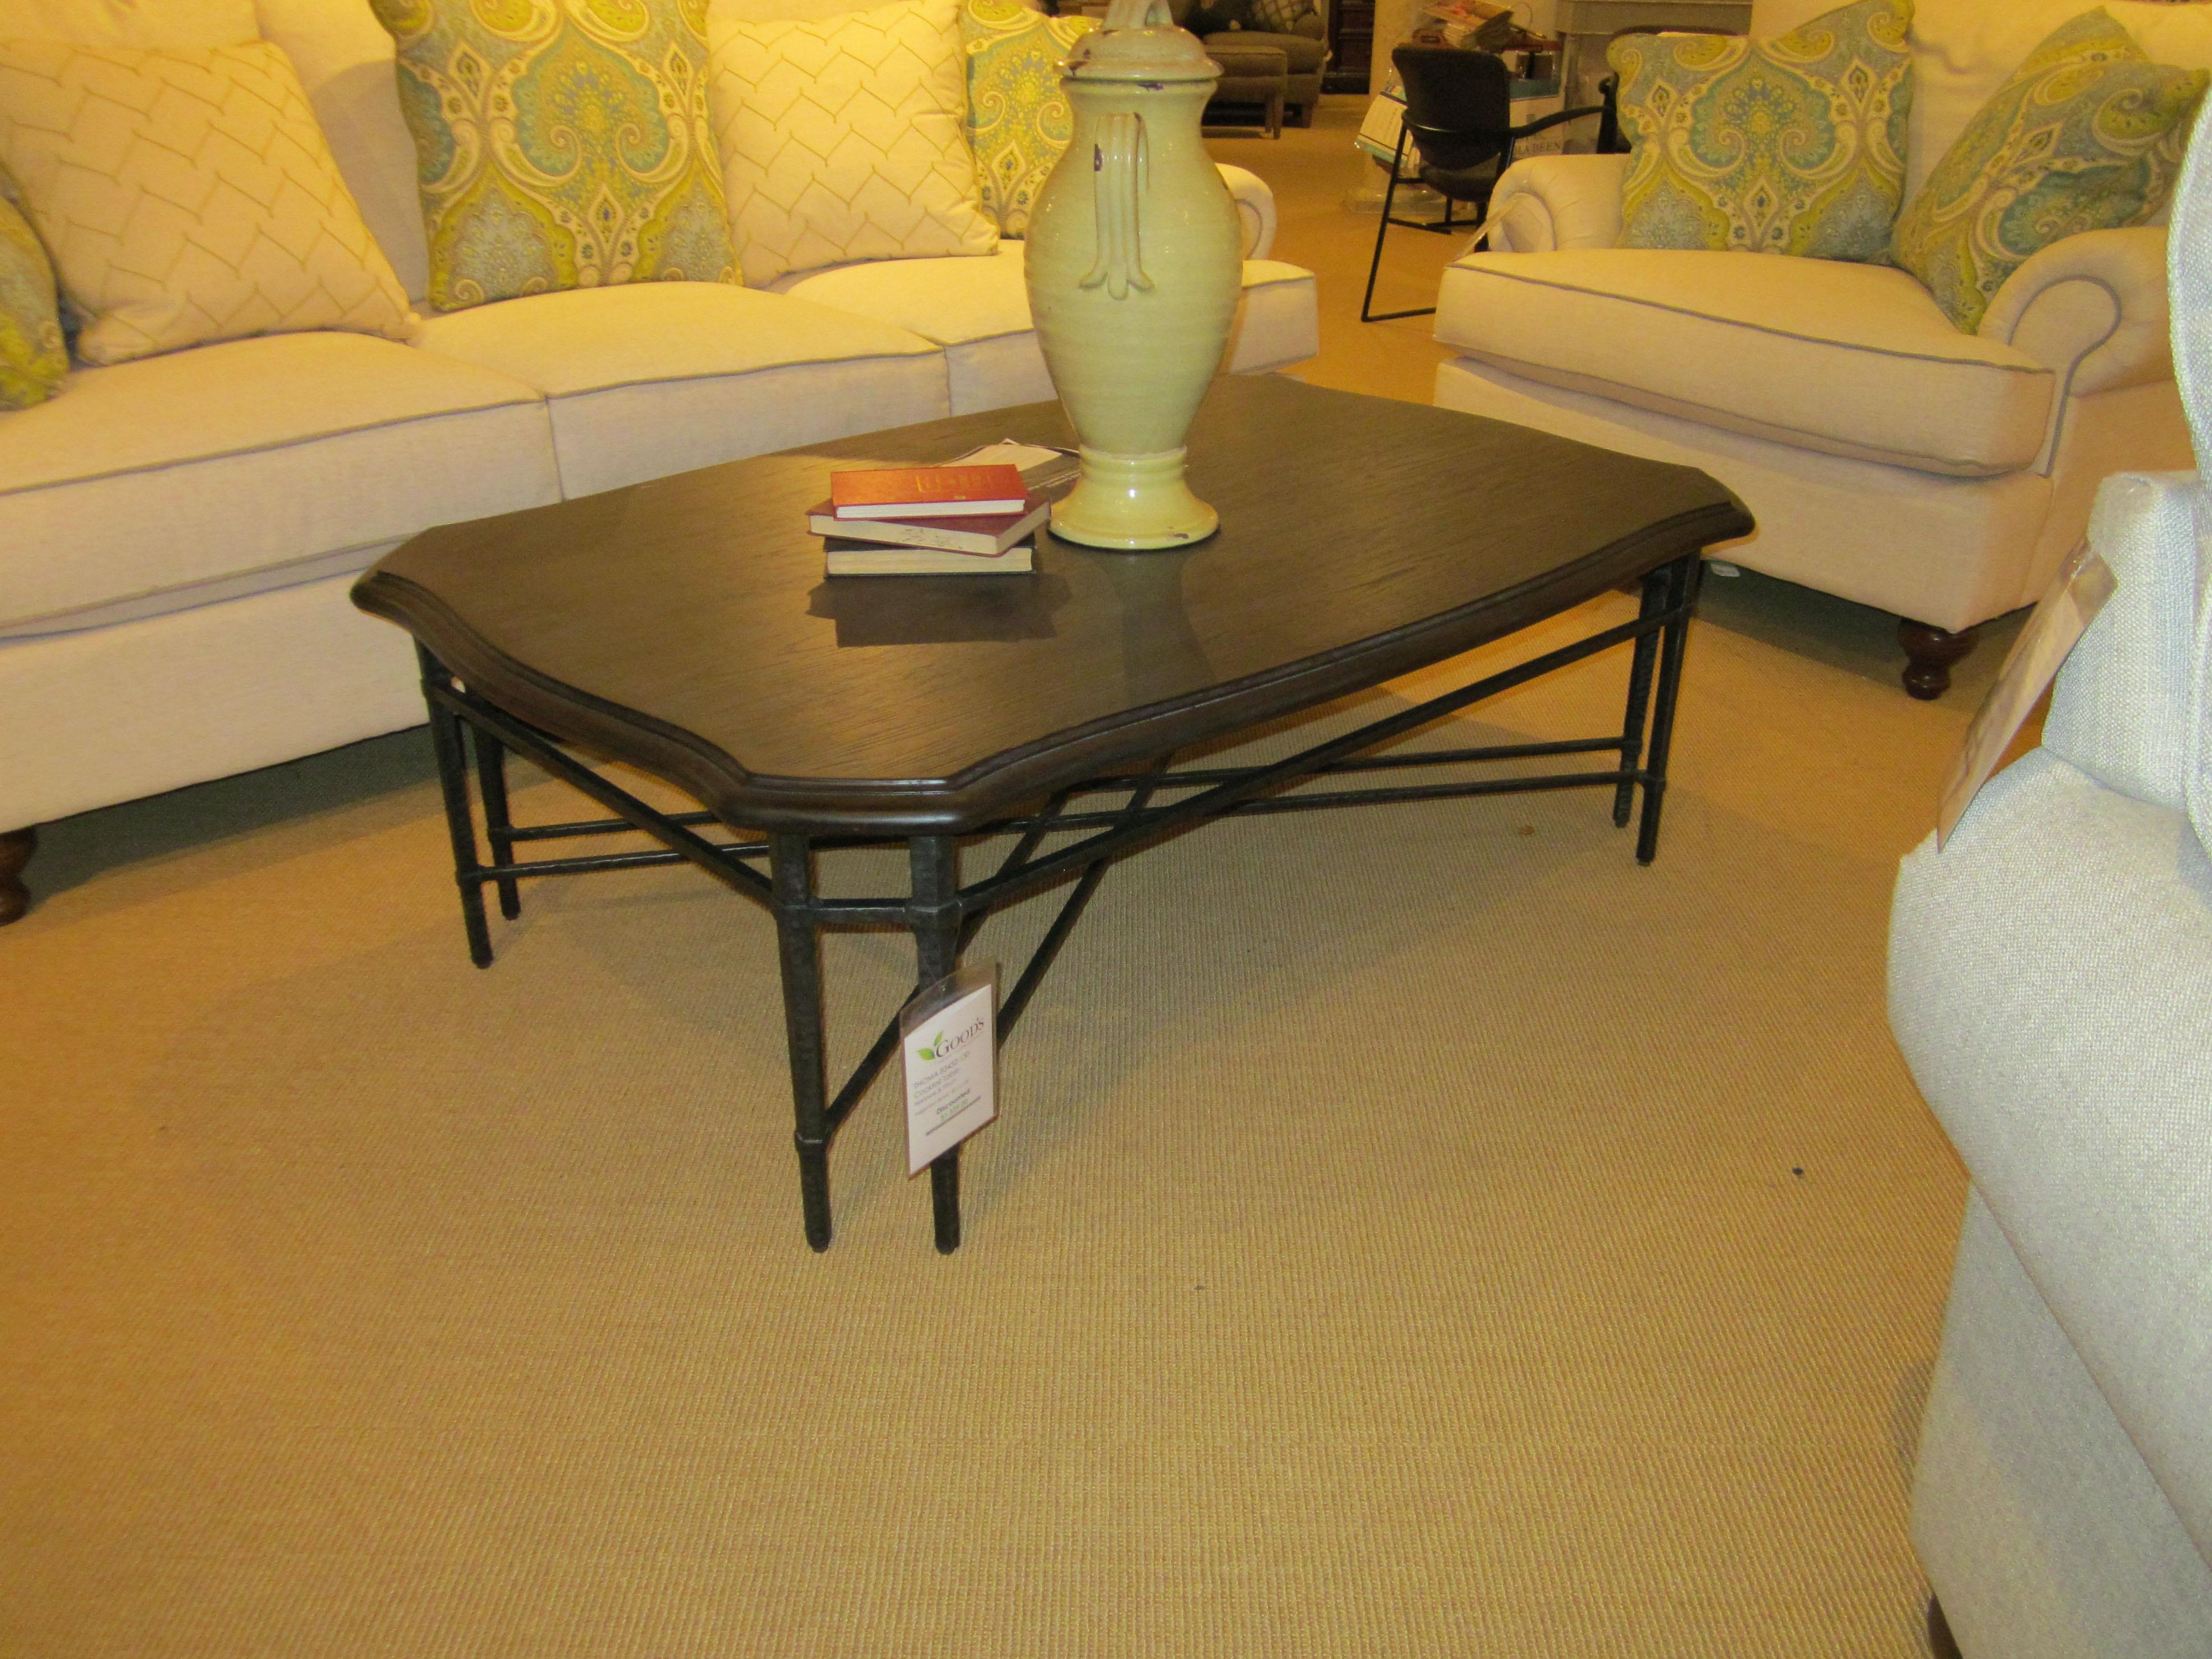 Charmant Goods Home Furnishings